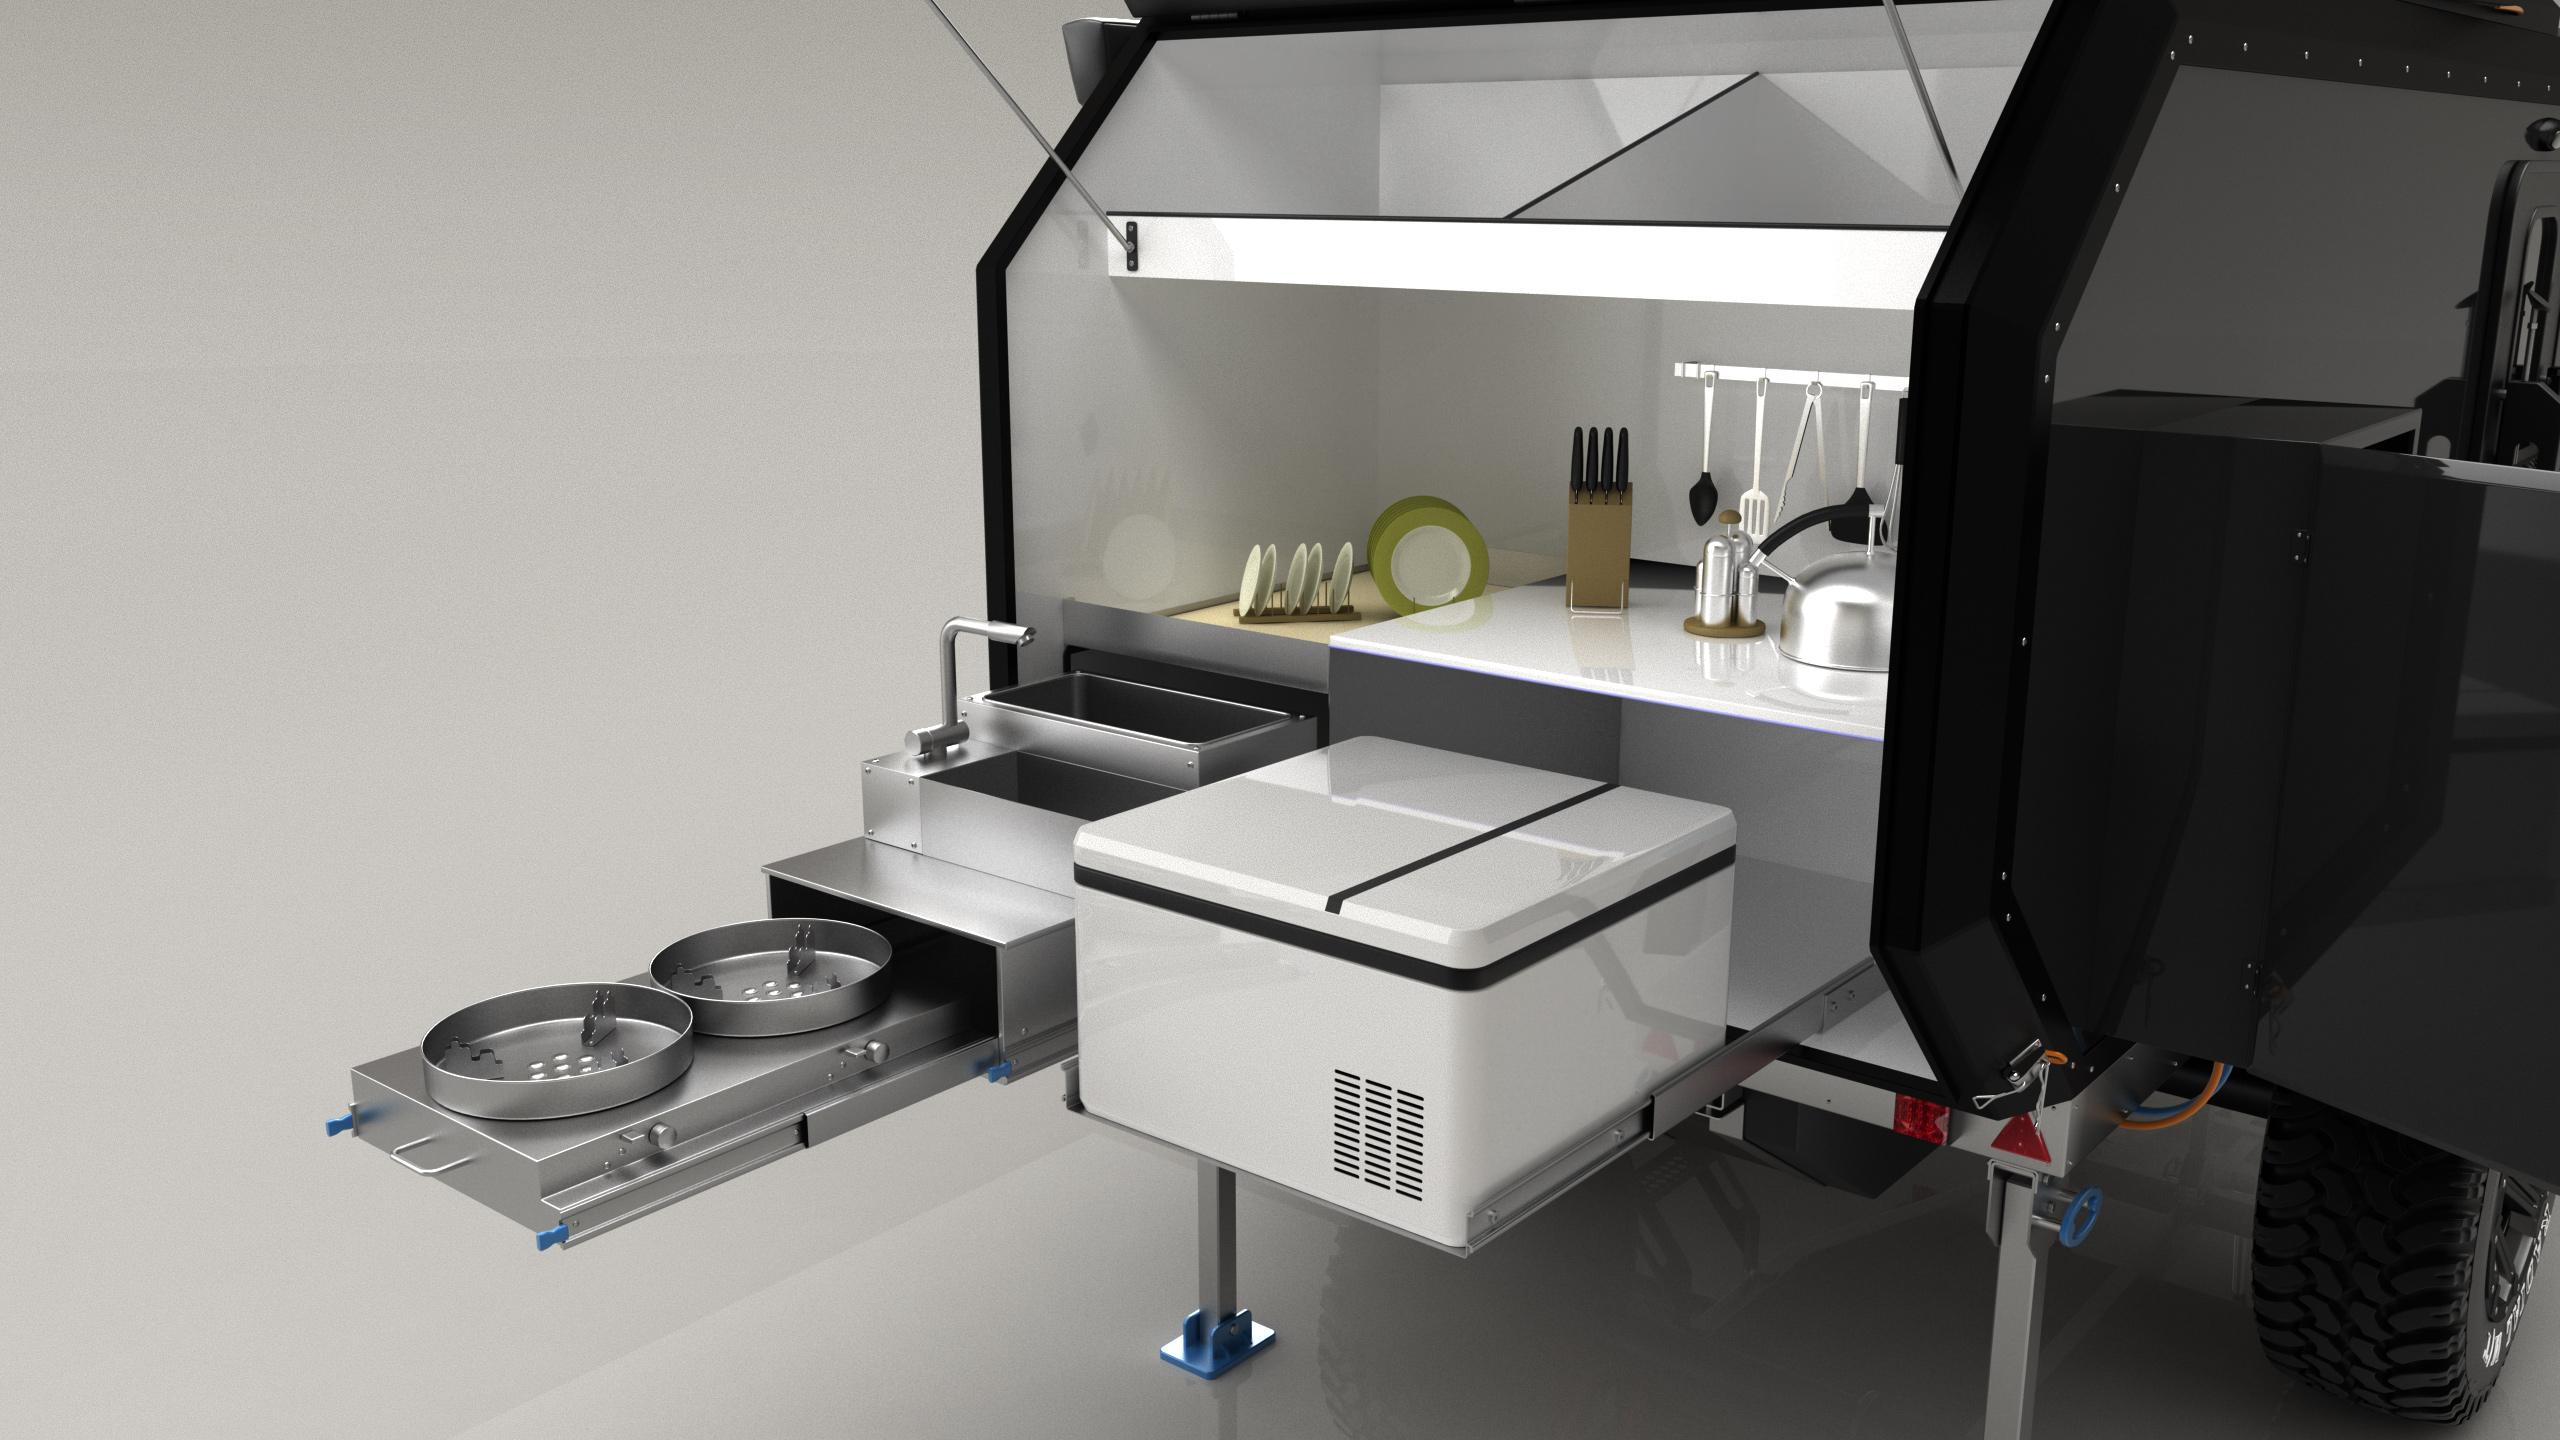 X1-External-Open_Rear-Kitchen-View